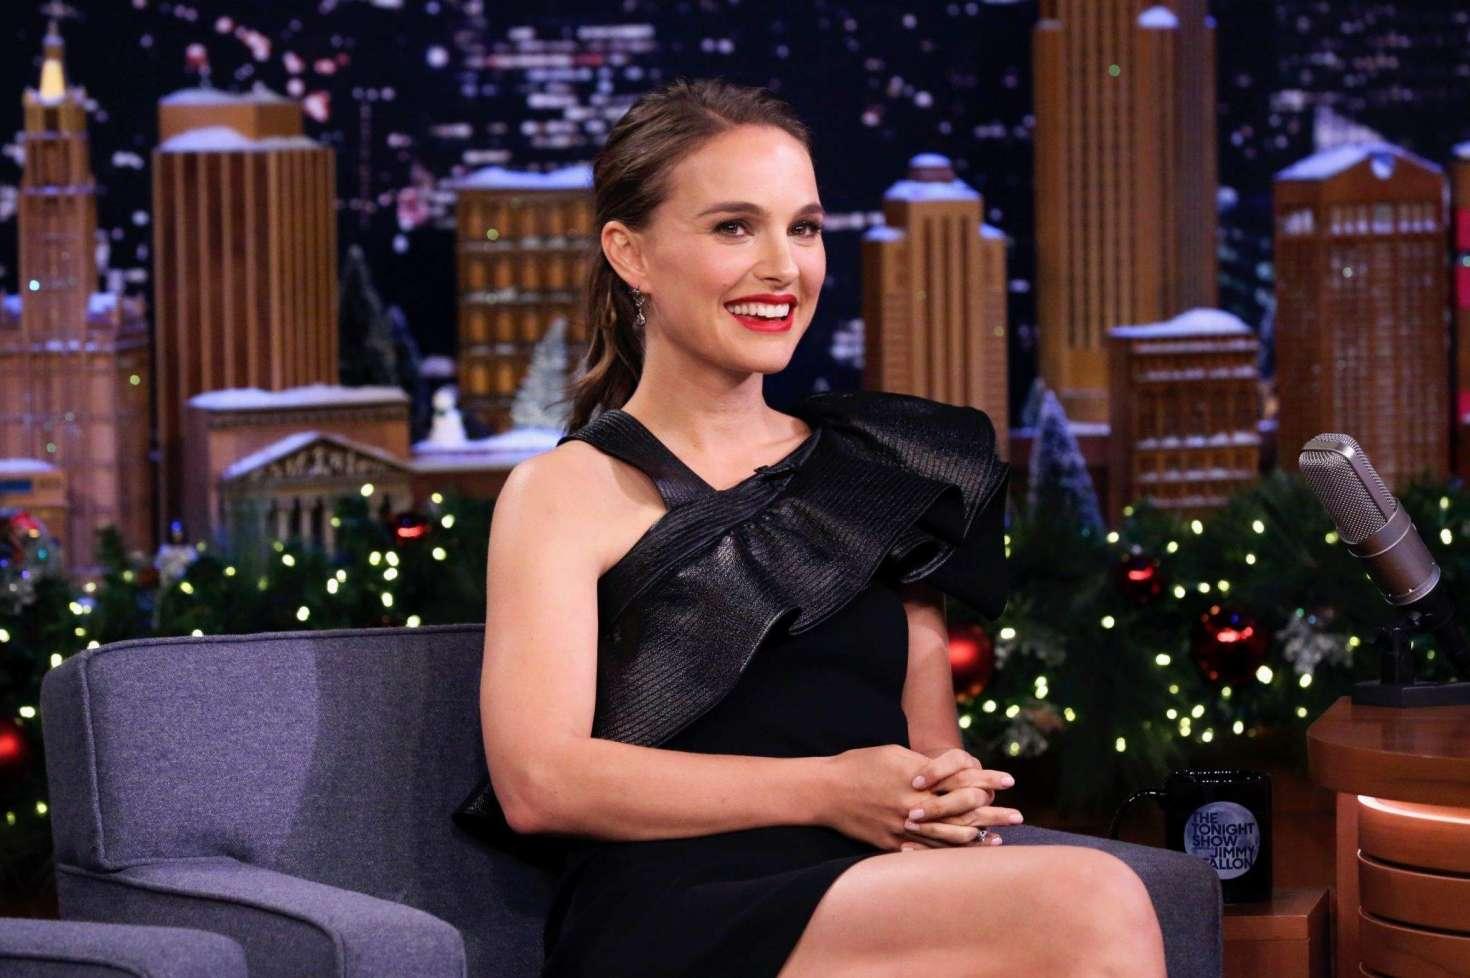 Natalie Portman 2018 : Natalie Portman: The Tonight Show Starring Jimmy Fallon -06